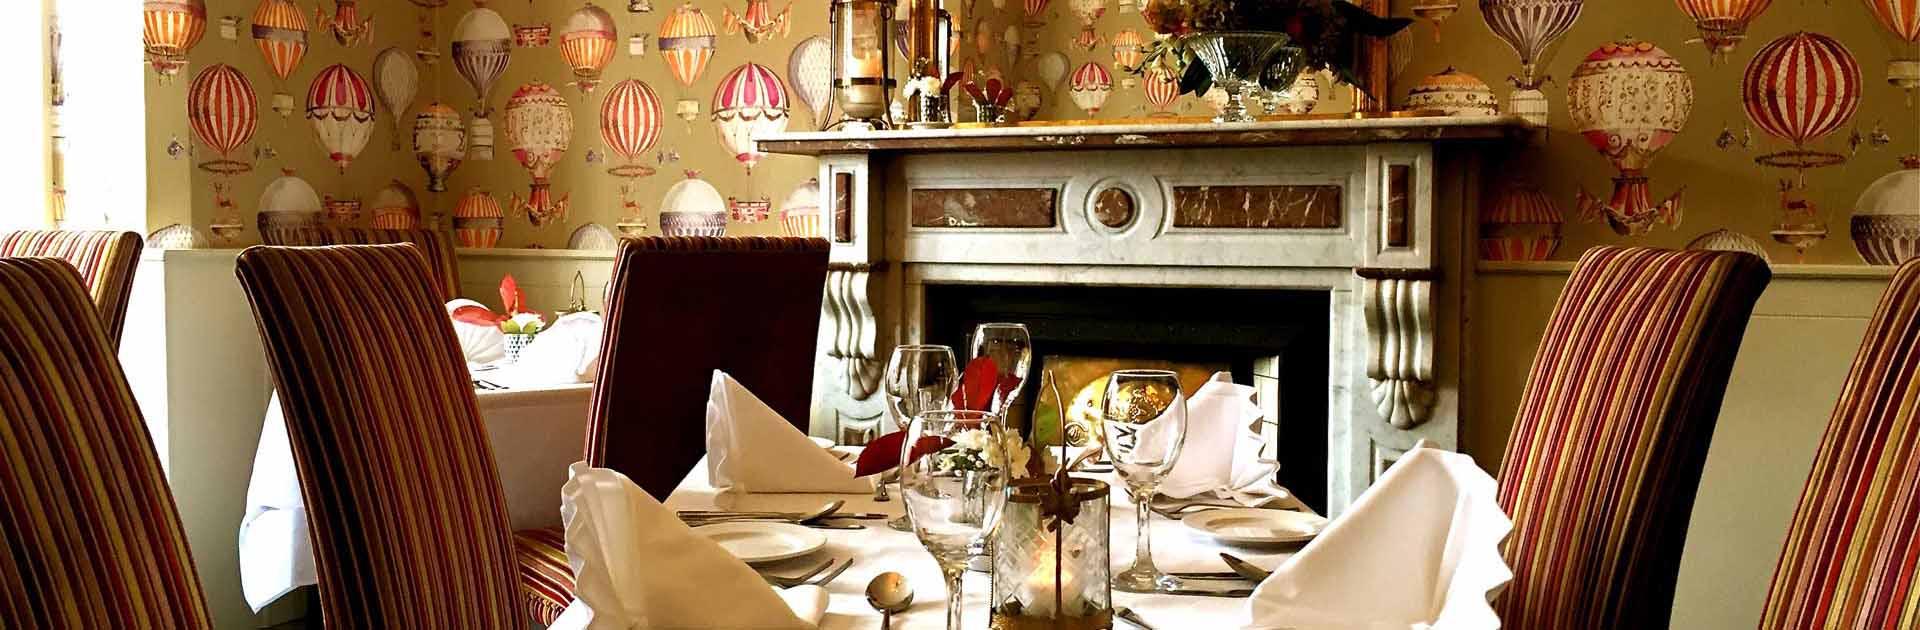 Official Website Glasnevin Dublin 9 Hotel Weddings Ireland